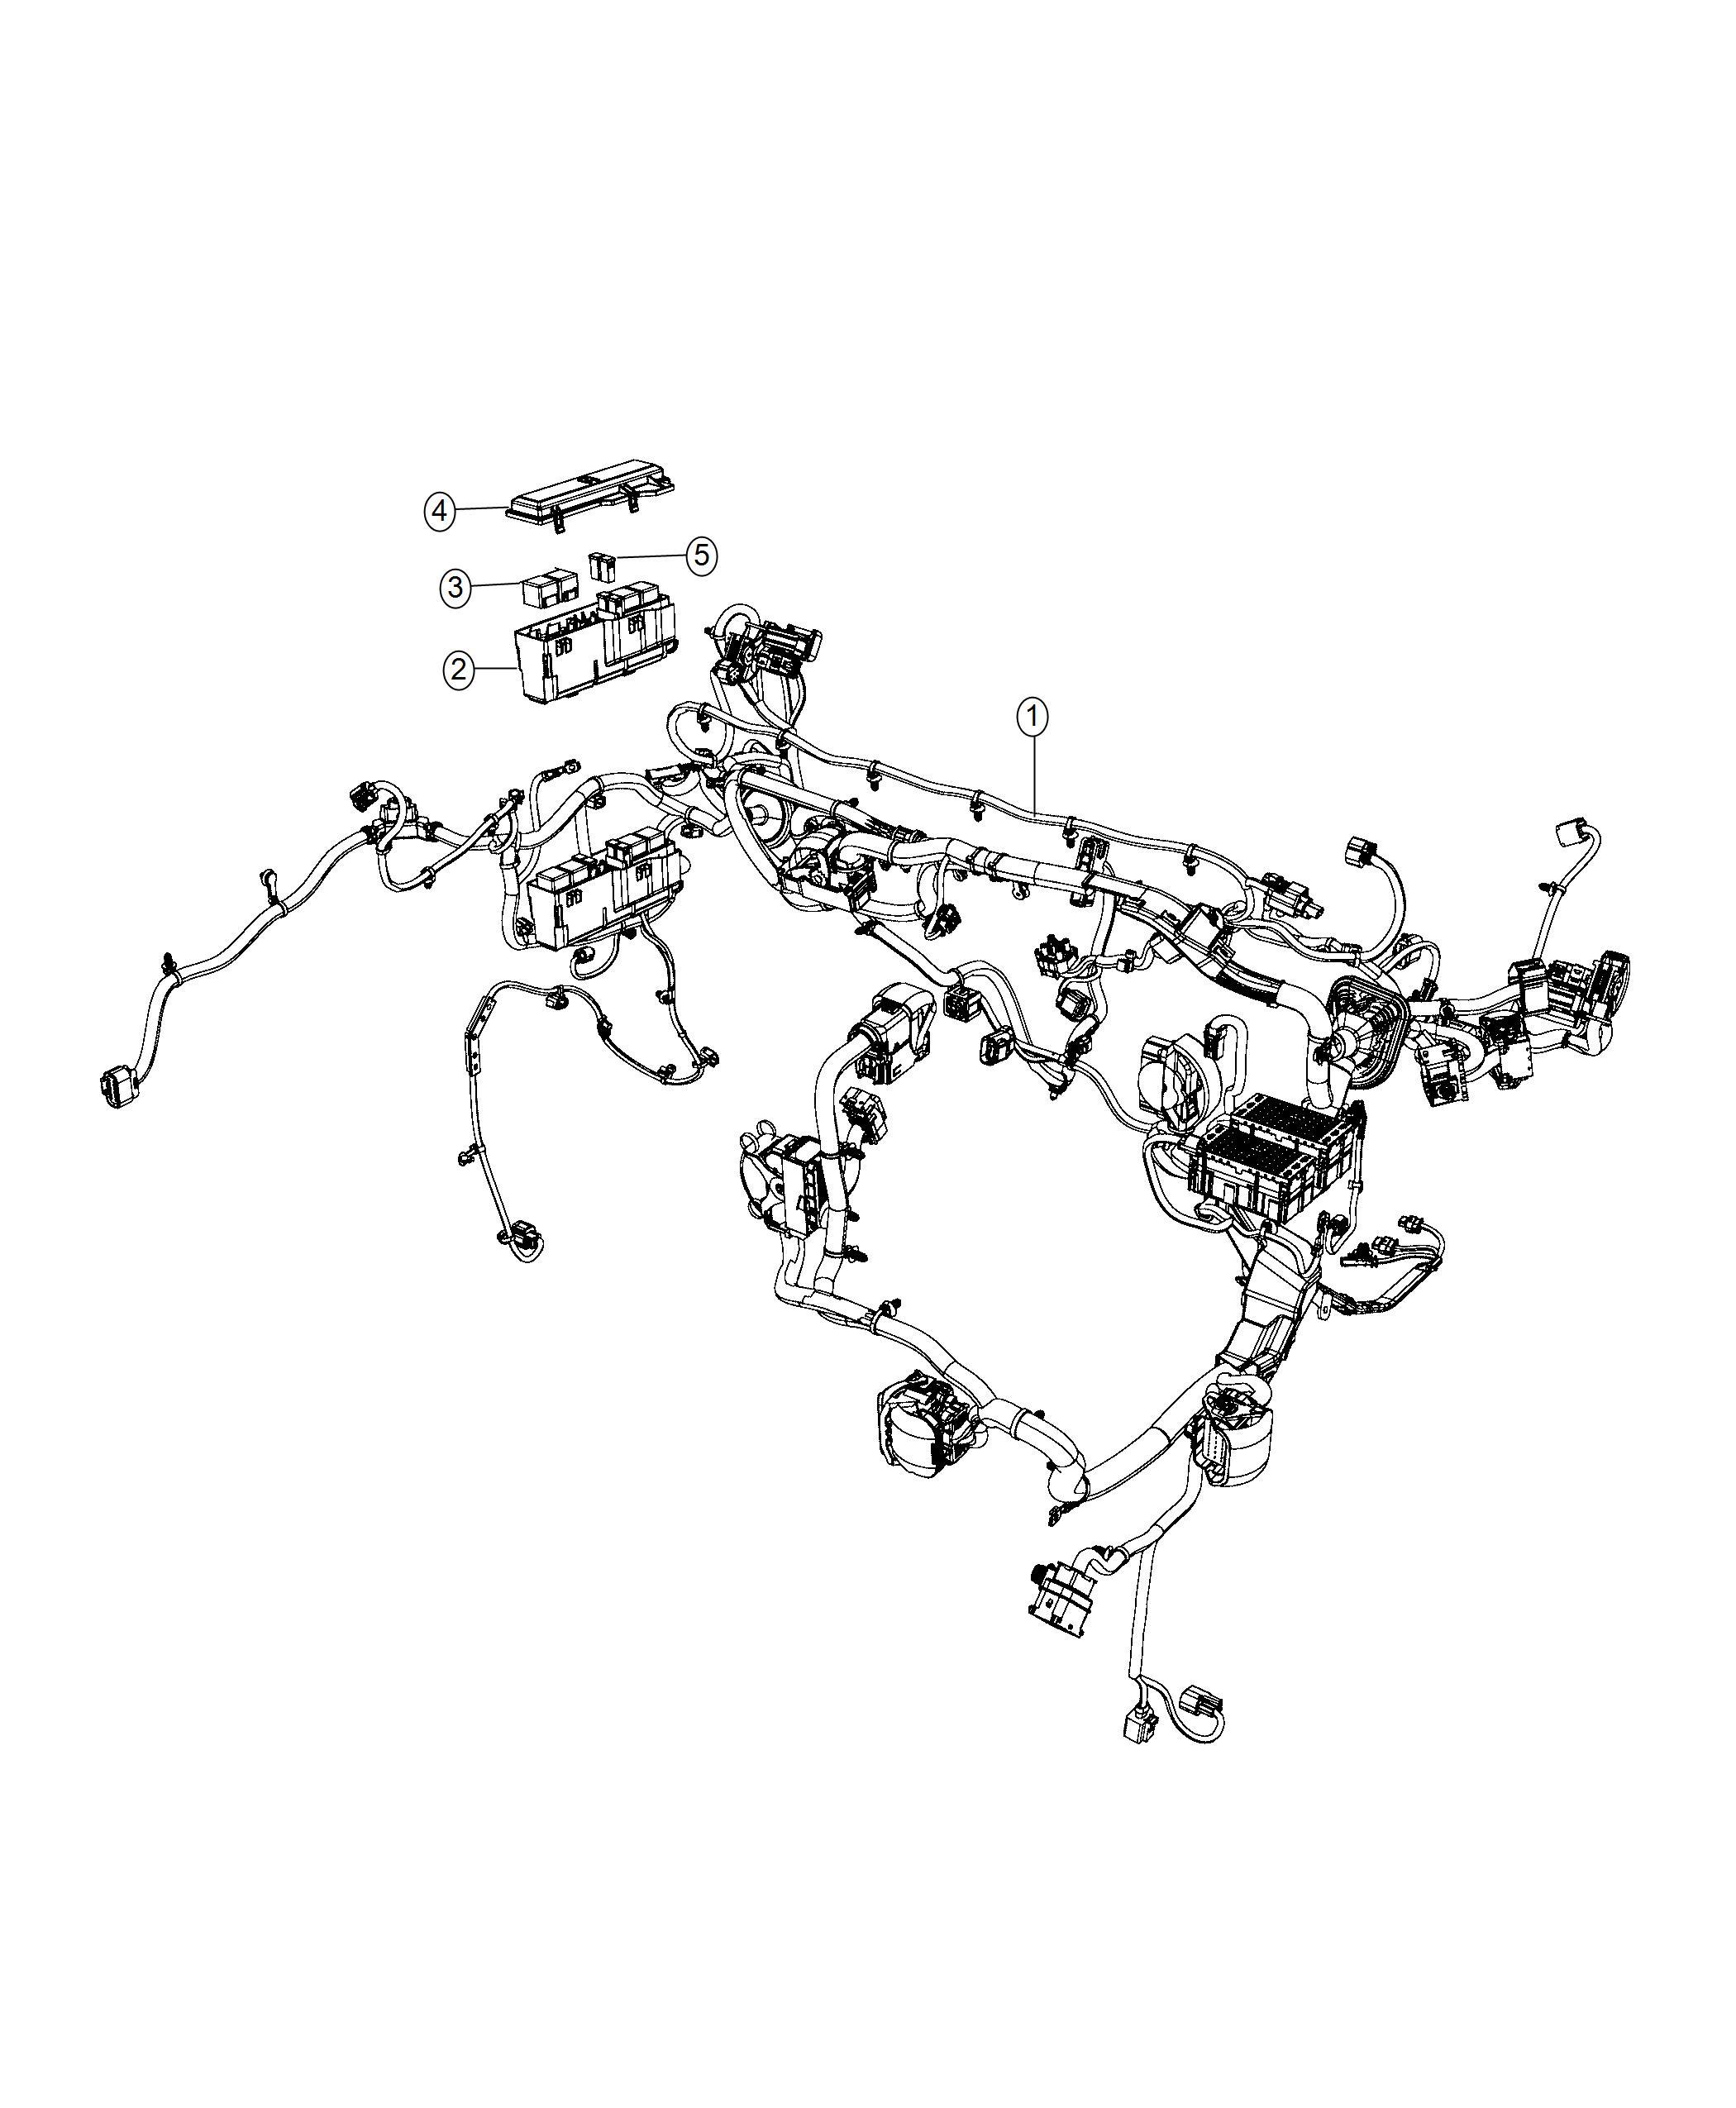 Jeep Cherokee Wiring. Dash. [automatic headlamp leveling